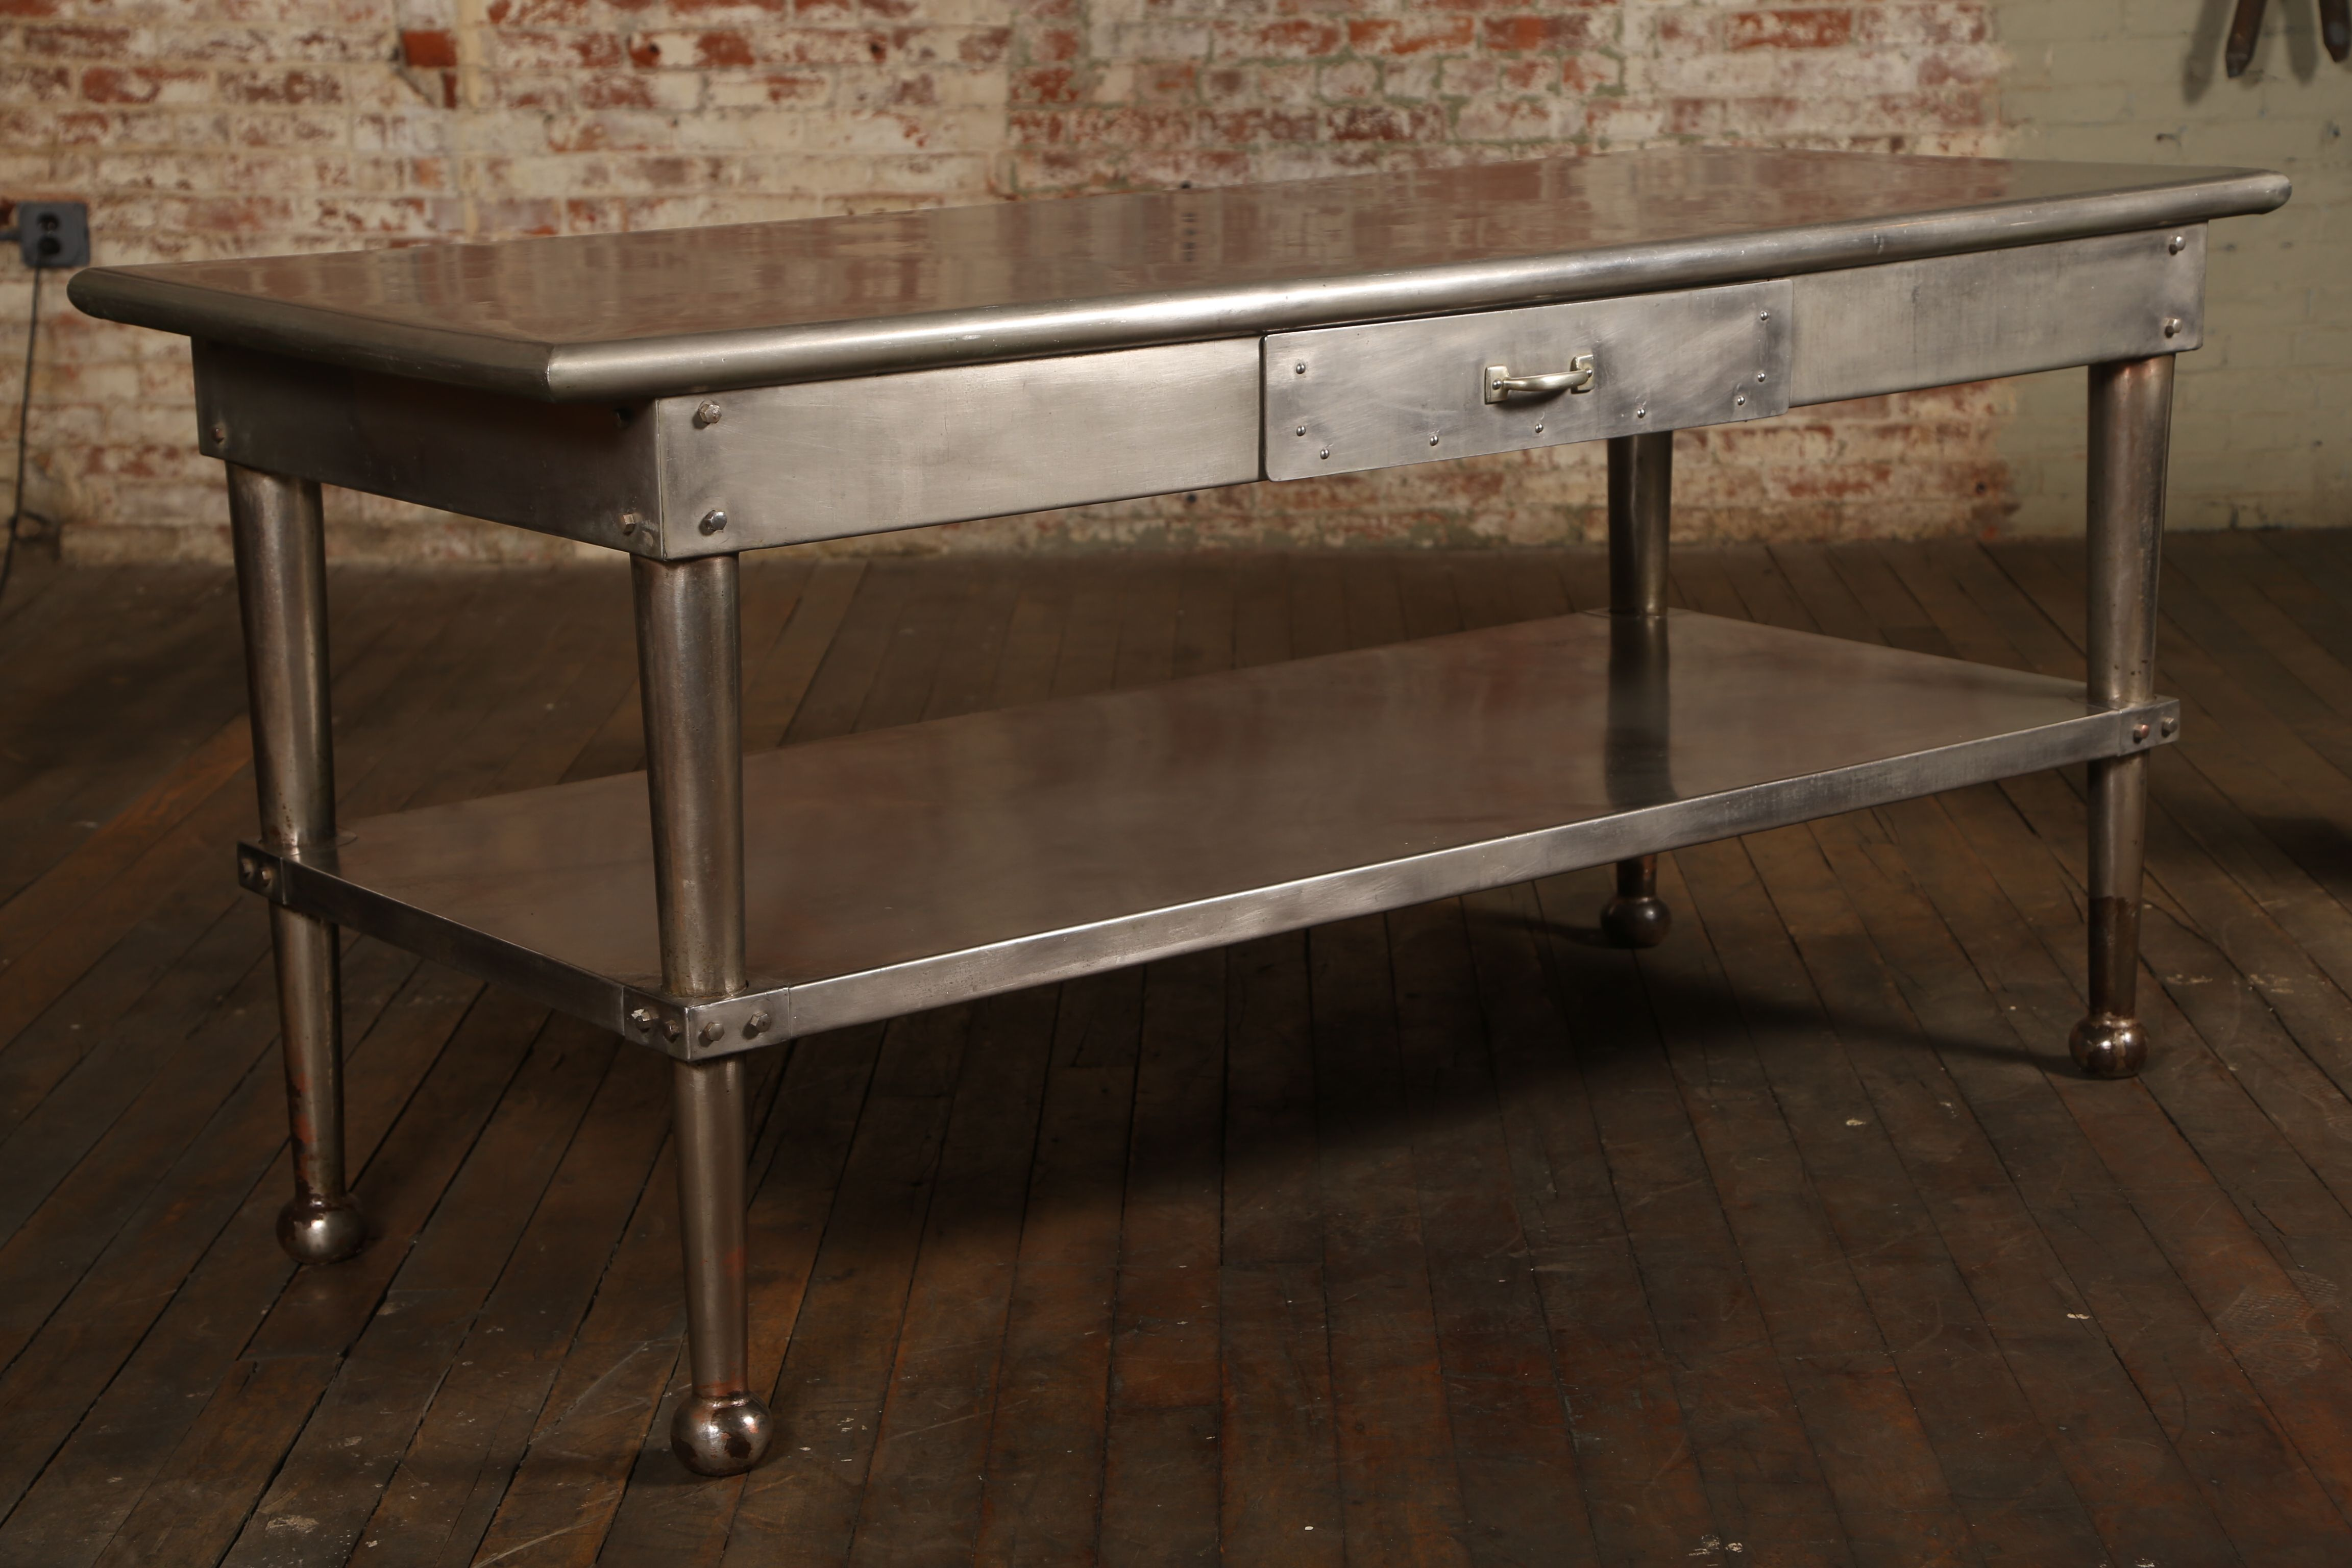 Industrial Kitchen Table Stainless Steel Stainless Steel Kitchen Table Industrial Style Kitchen Stainless Backsplash